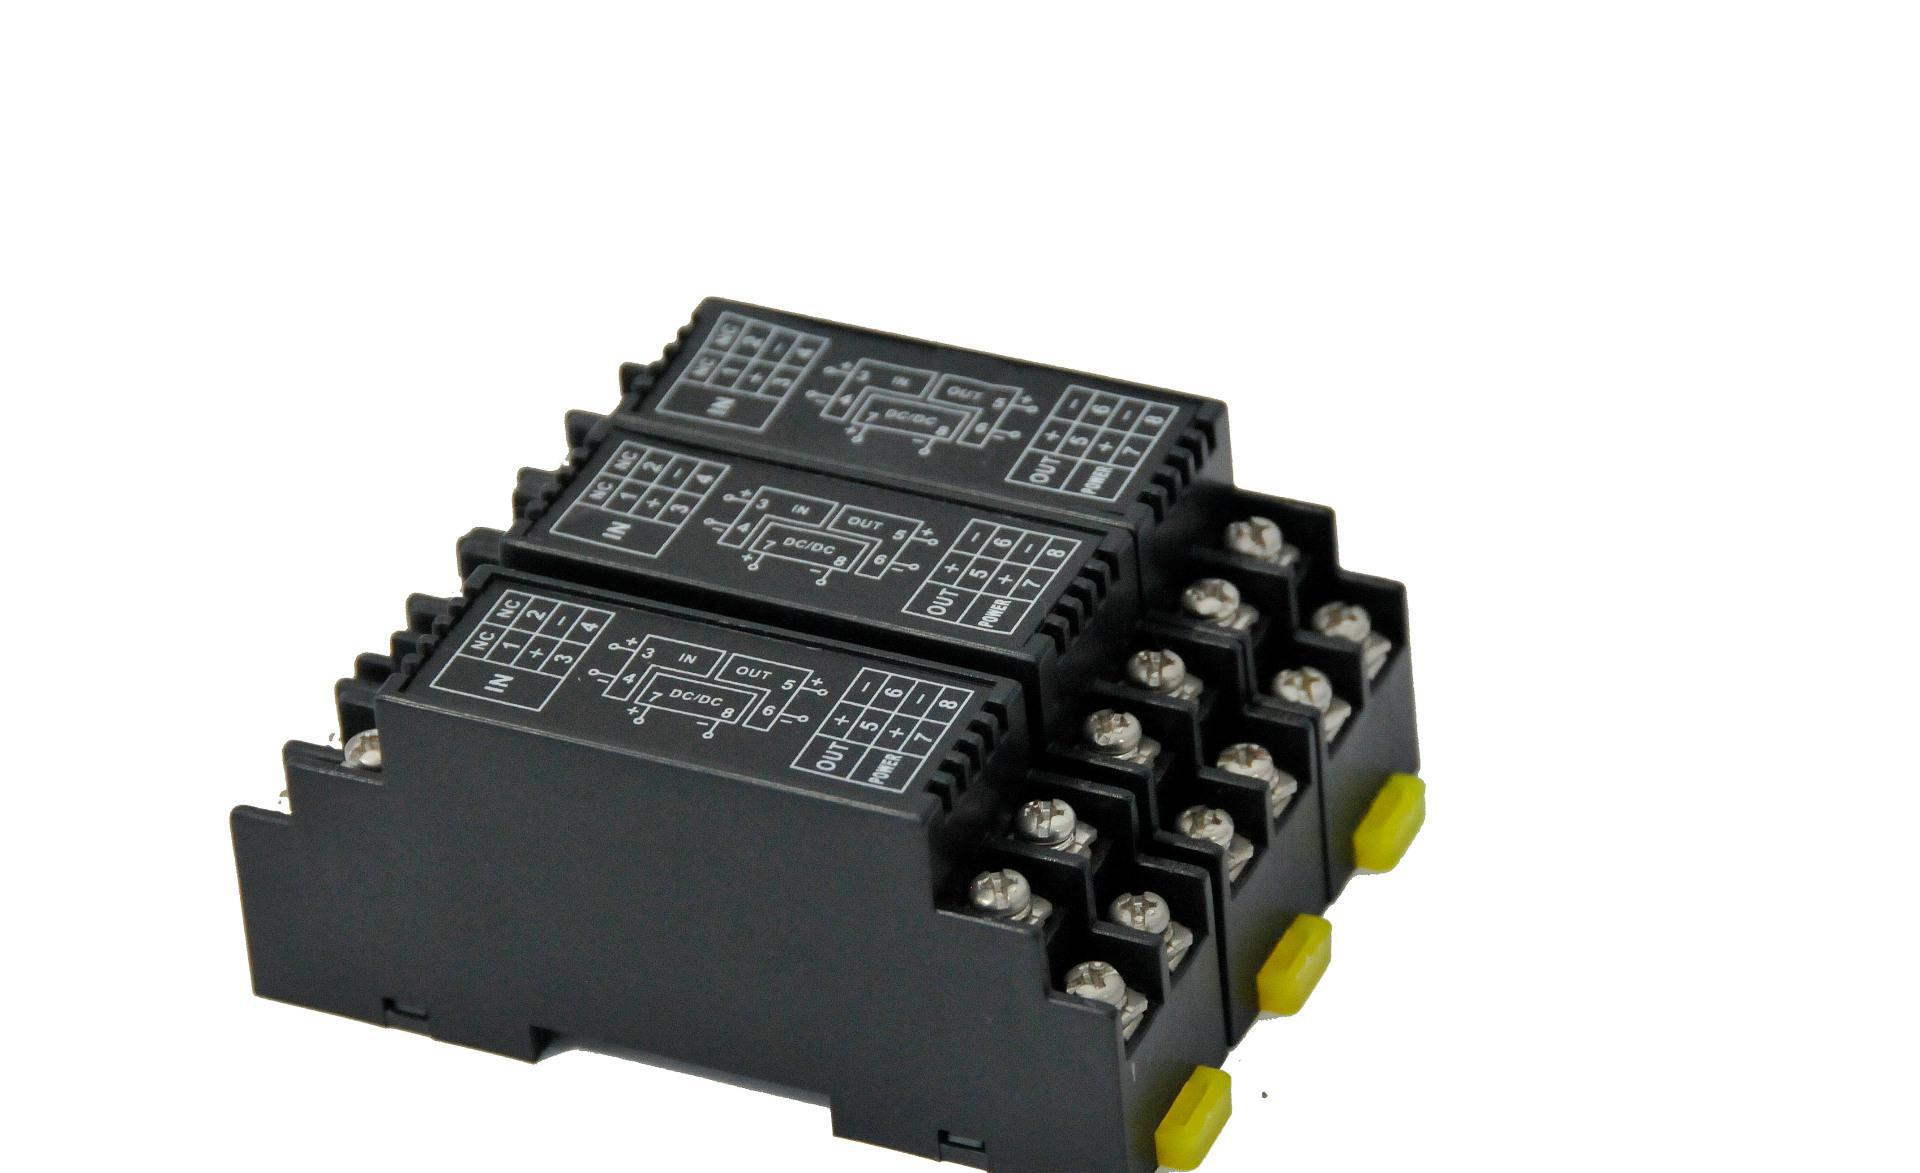 WS1521 DC Voltage Transmitter Signal Isolator 4 20mA Current Conversion Module 0 10V 0 5V